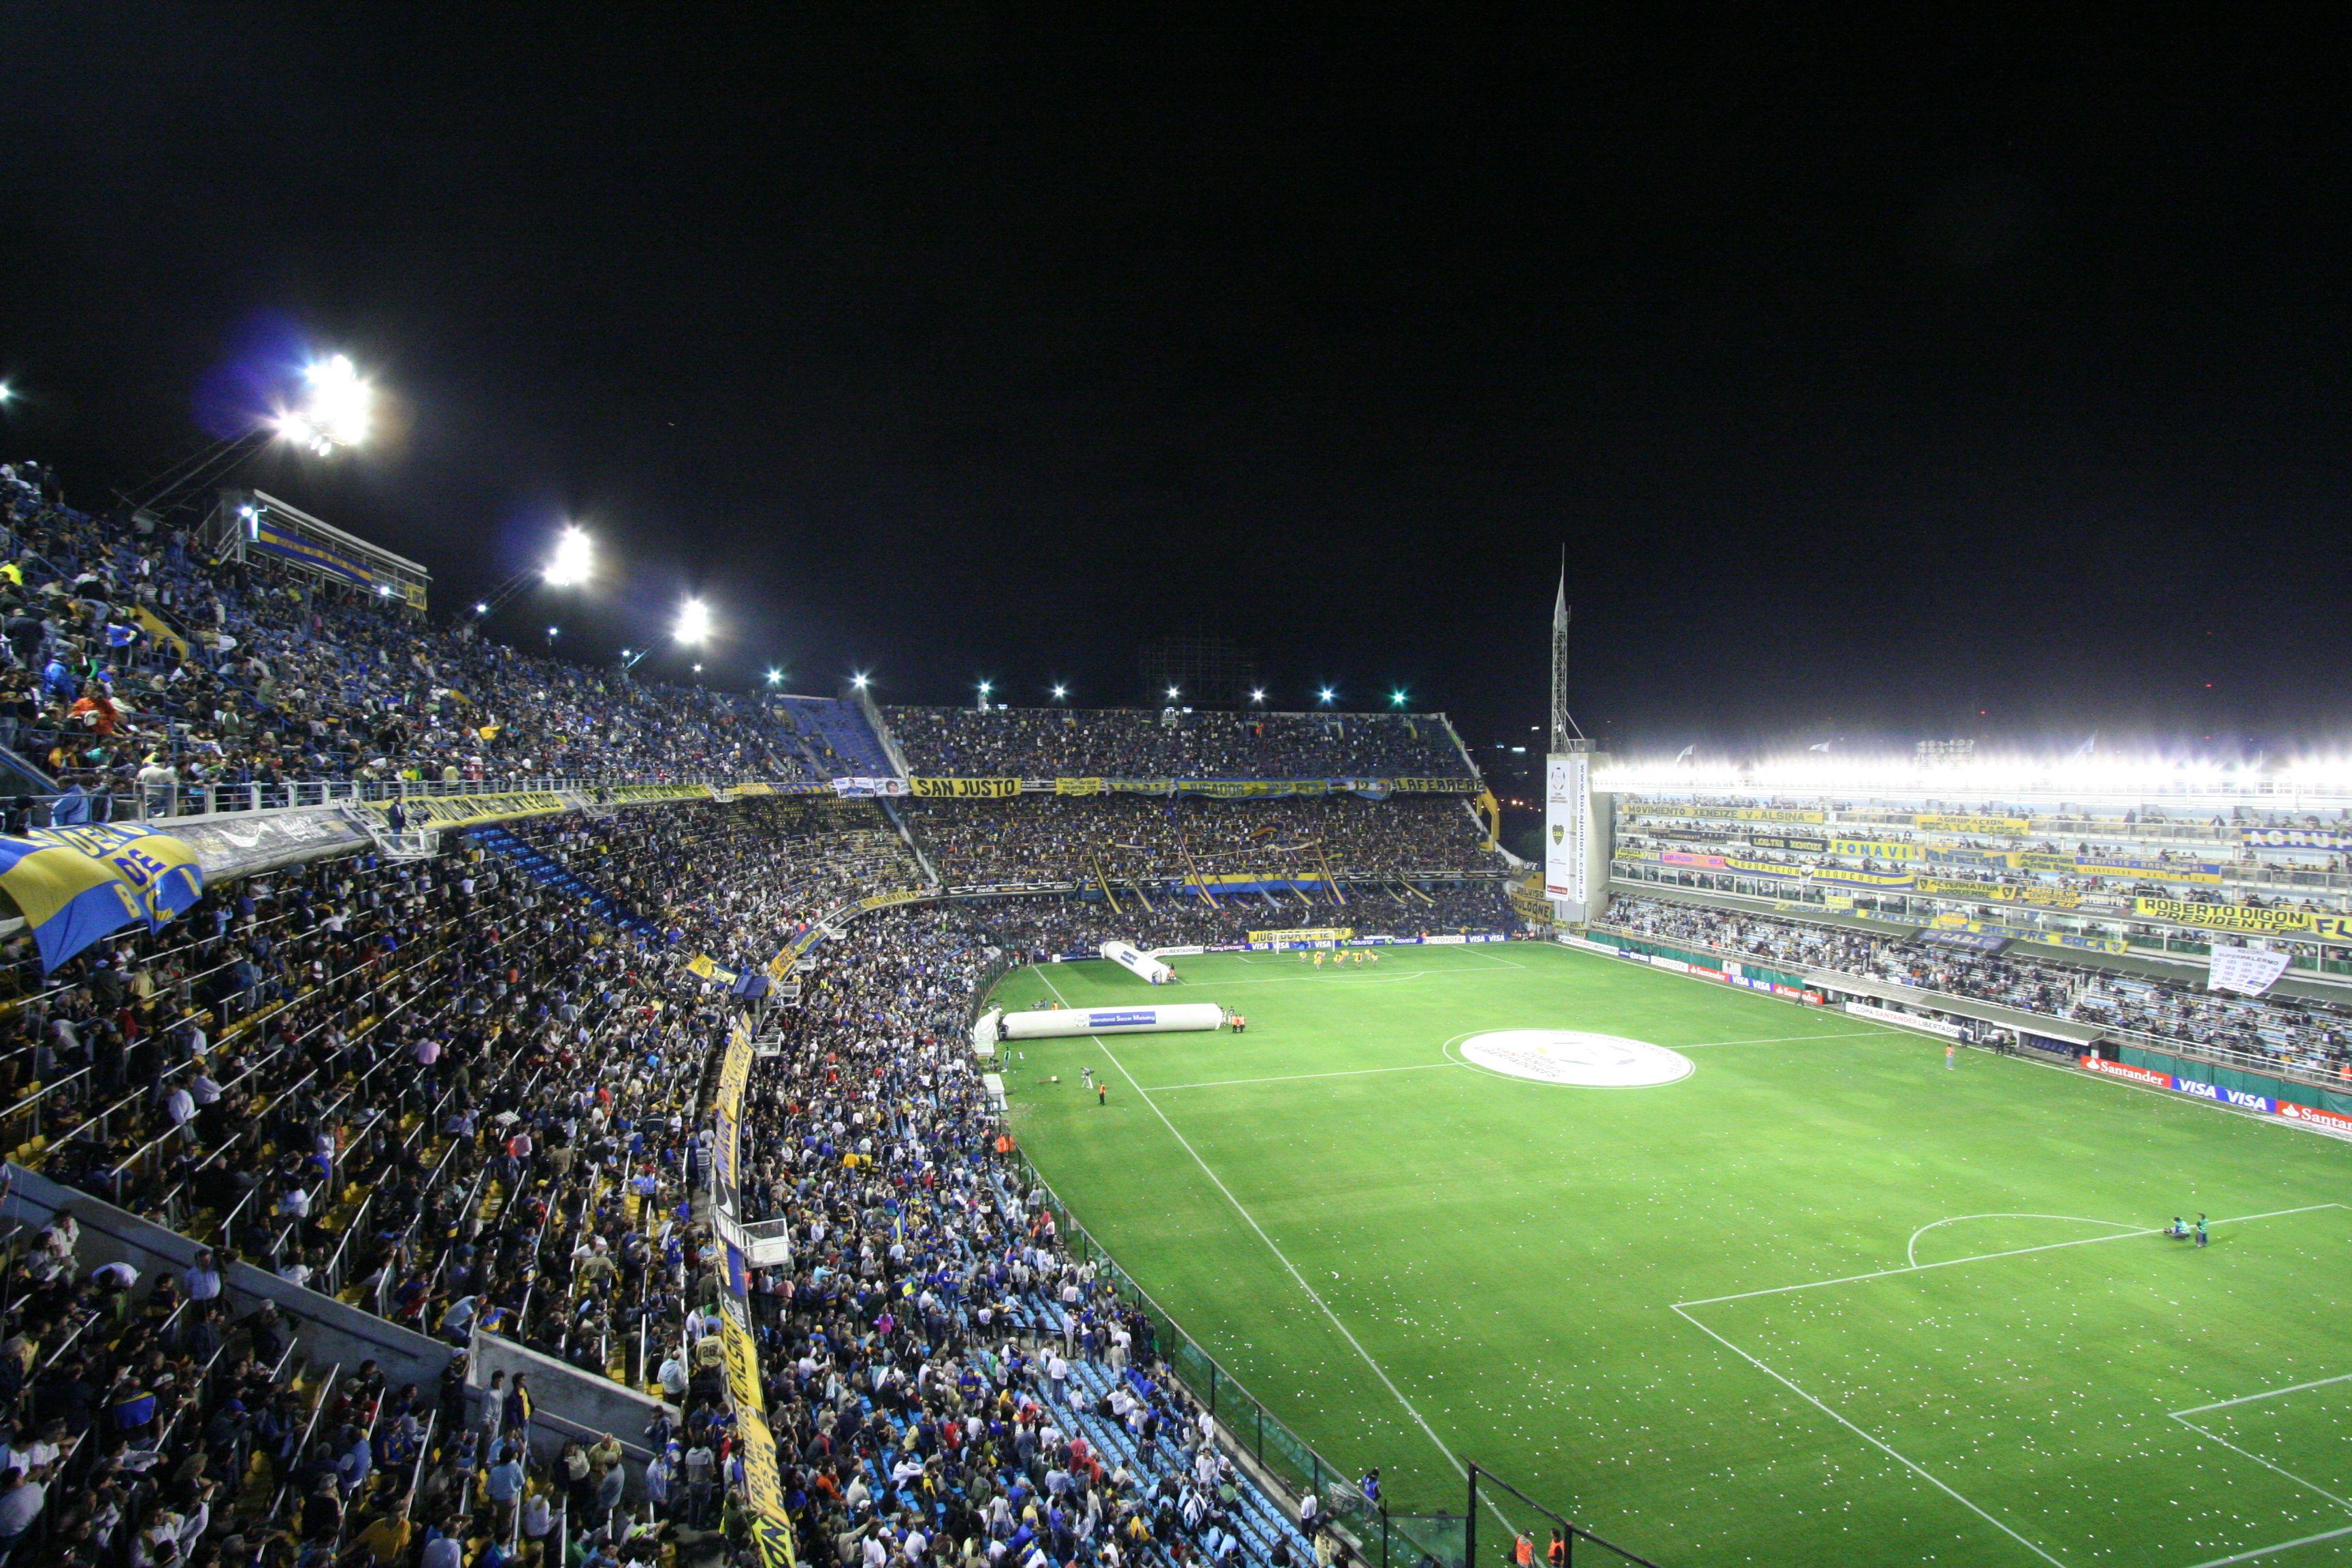 Oficial: Argentina y Perú jugarán en la Bombonera